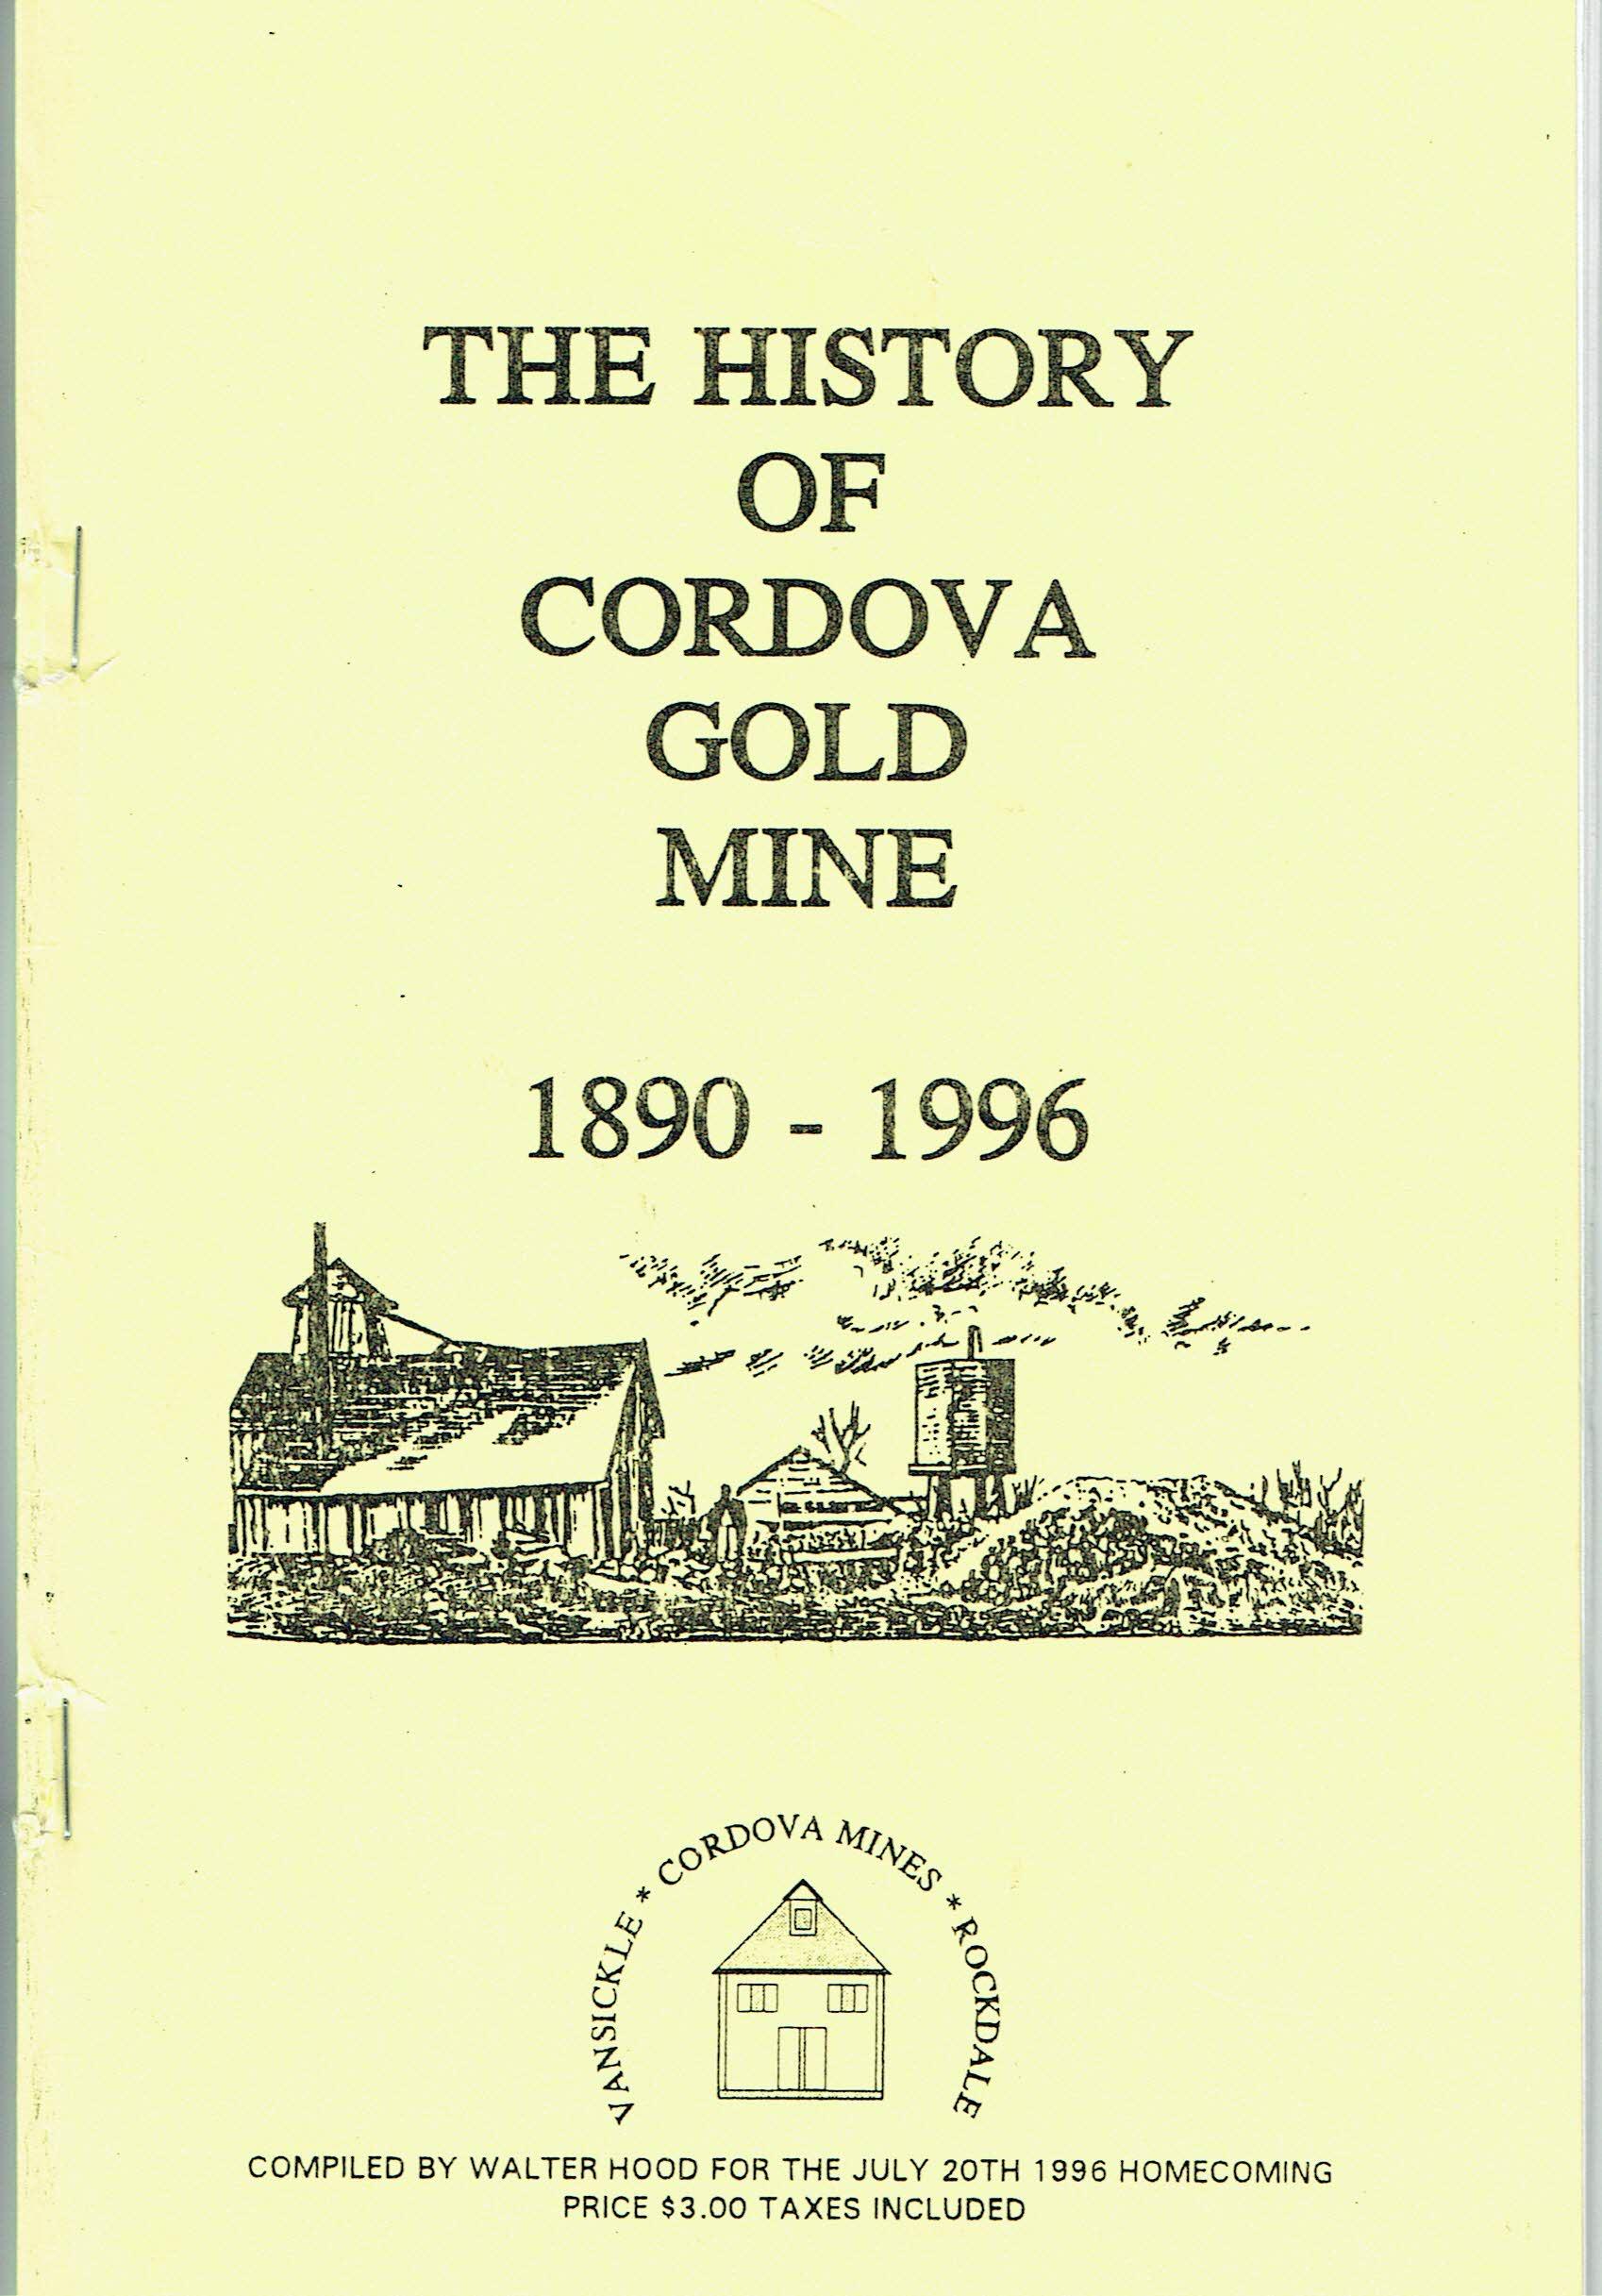 History of Cordova Gold Mines Cover.jpg